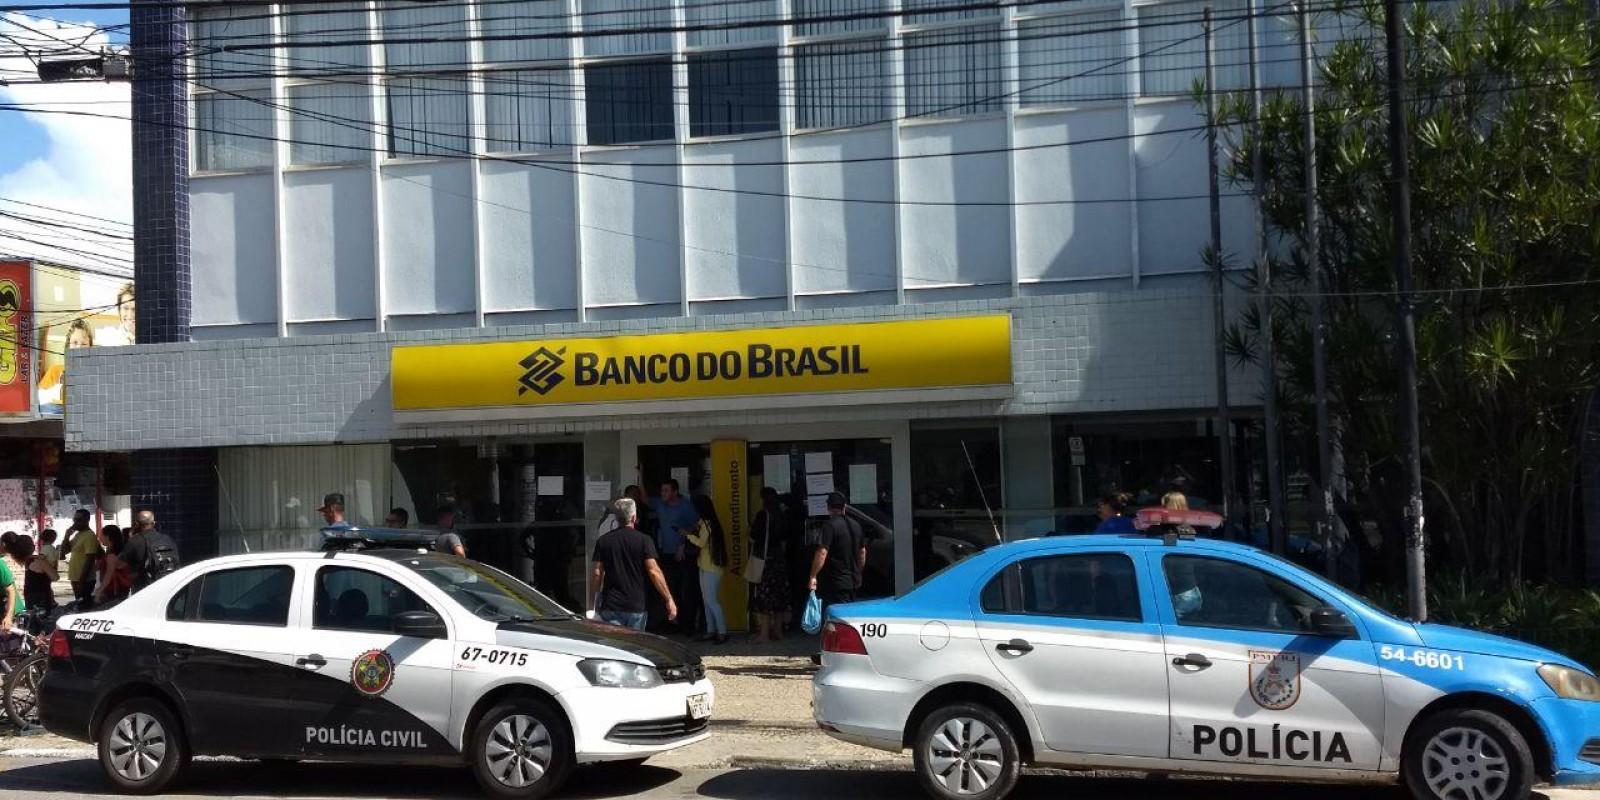 Agência do Banco do Brasil do centro de Macaé, sofre assalto